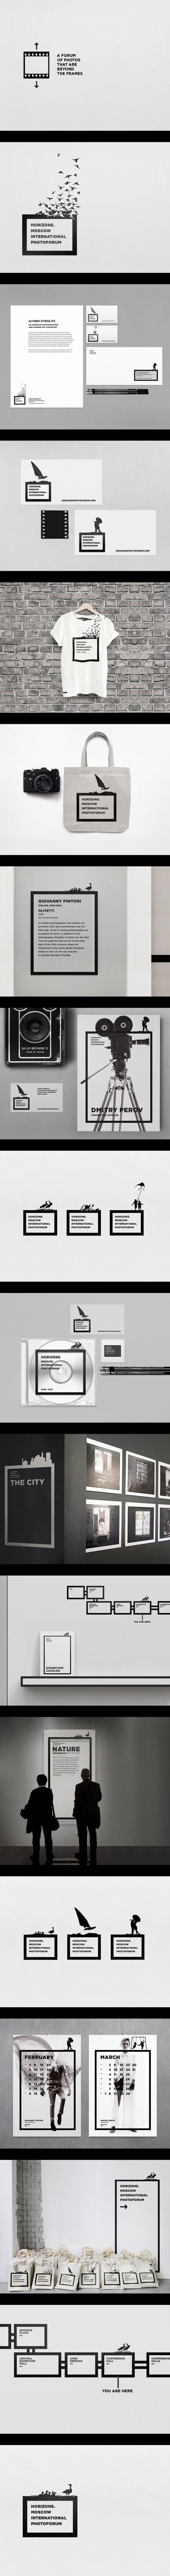 HORIZONS by Vova Lifanov, via Behance. packaging branding marketing PD